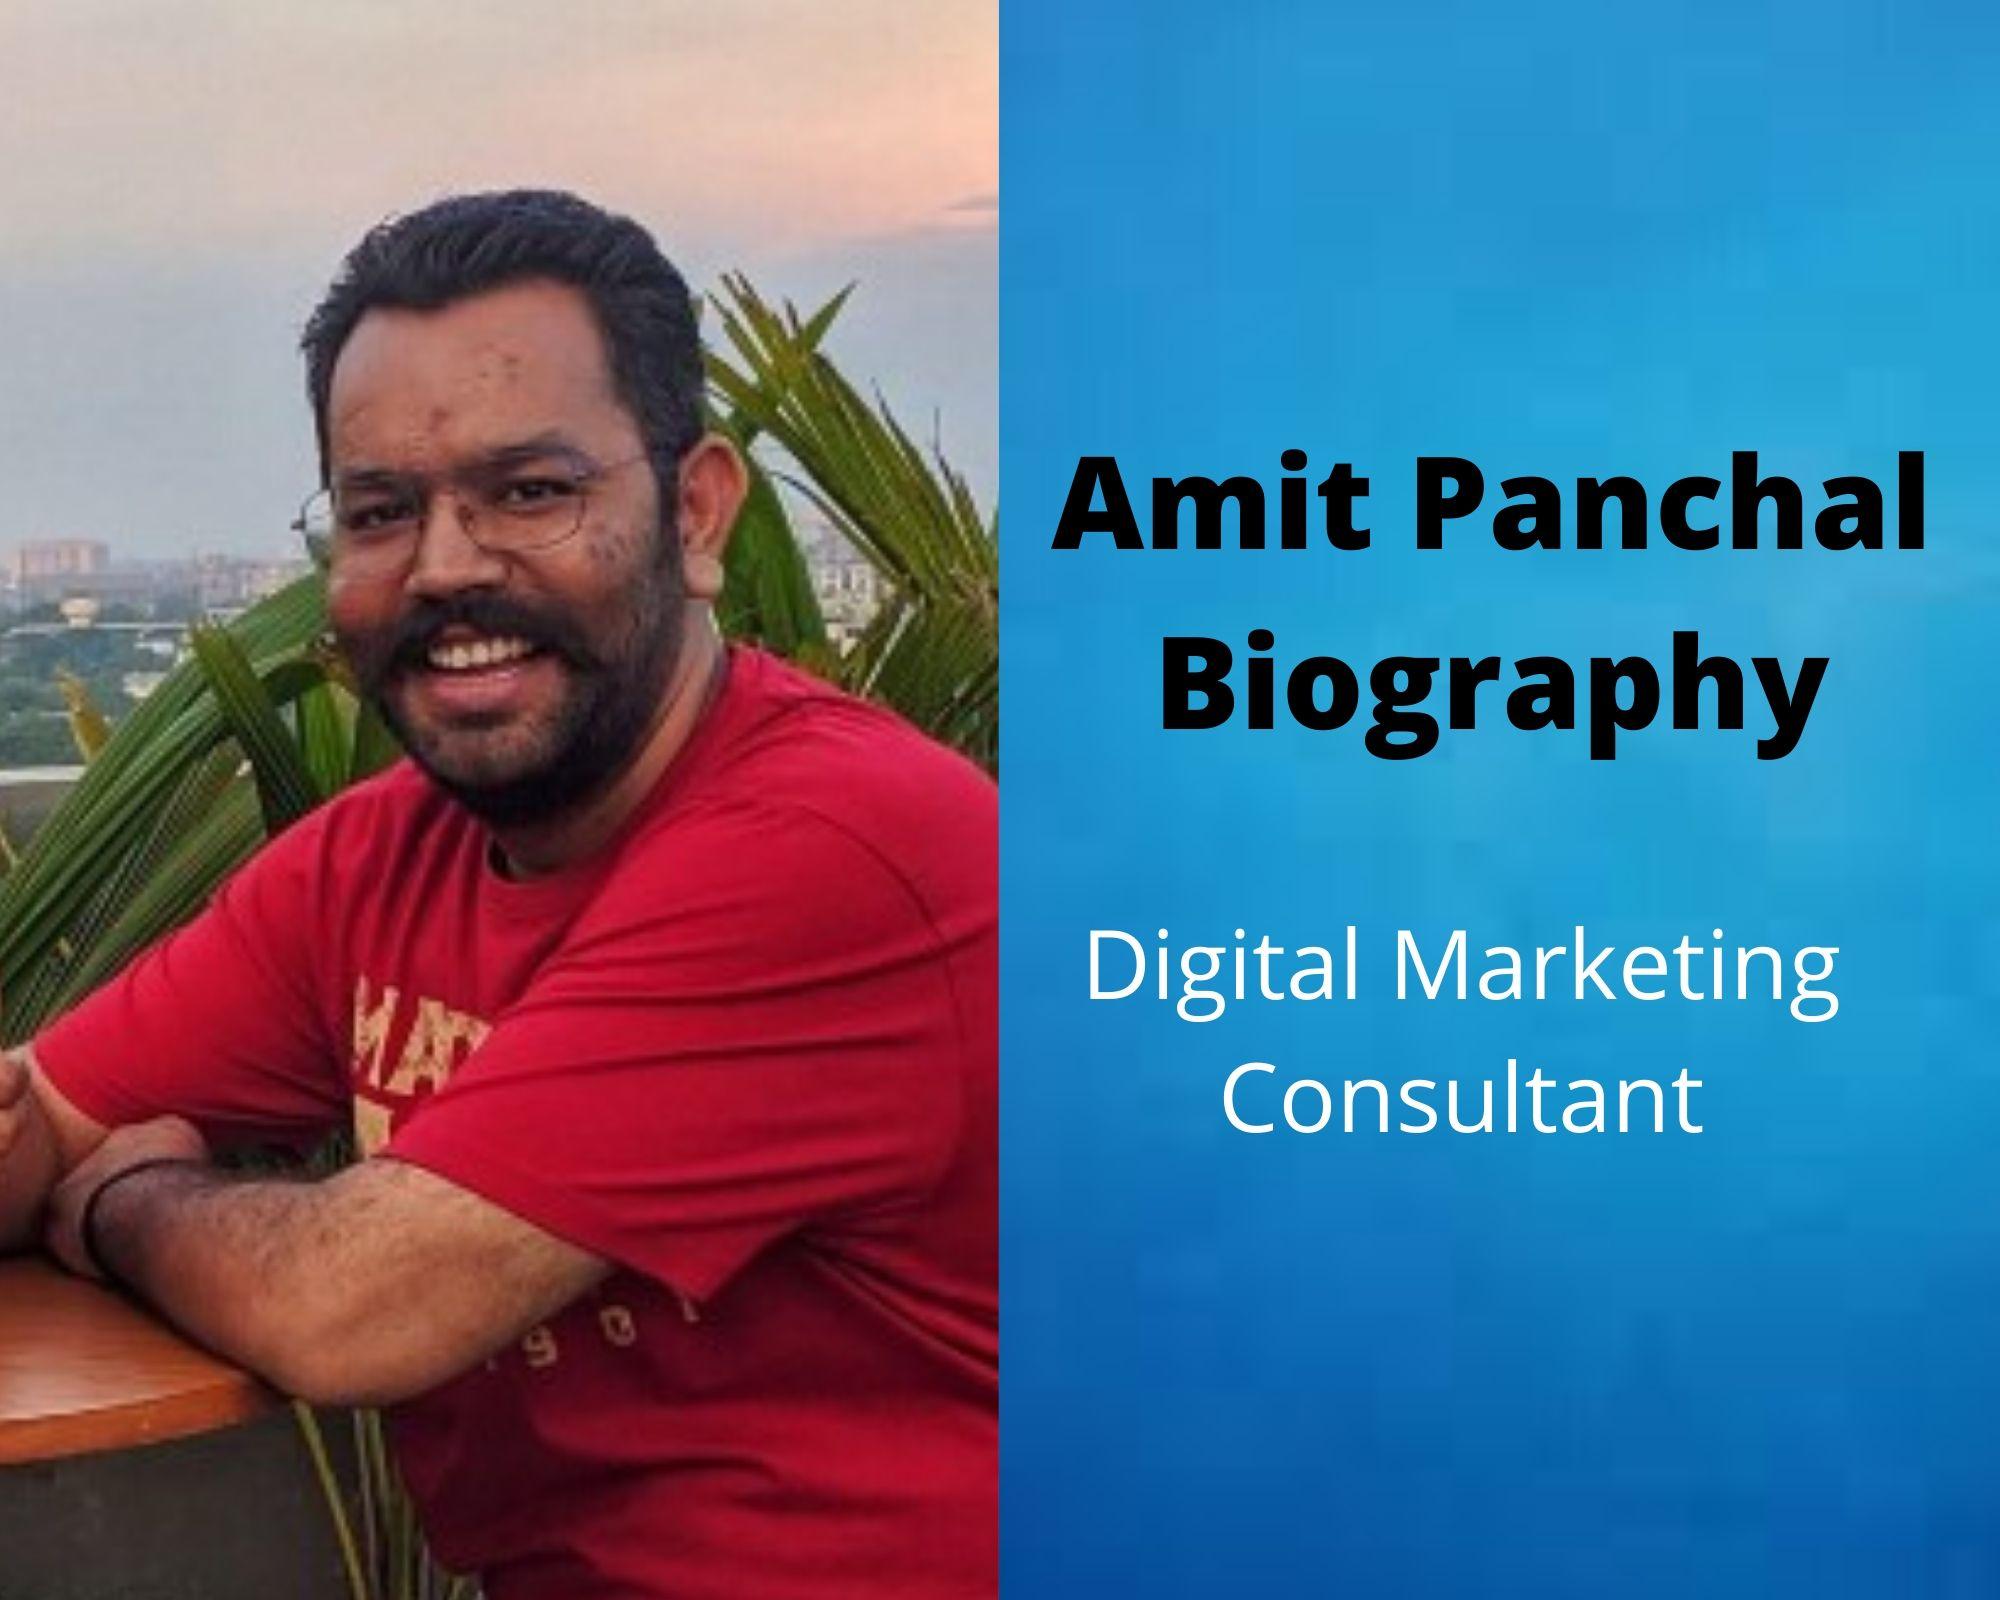 Amit-Panchal-Biography